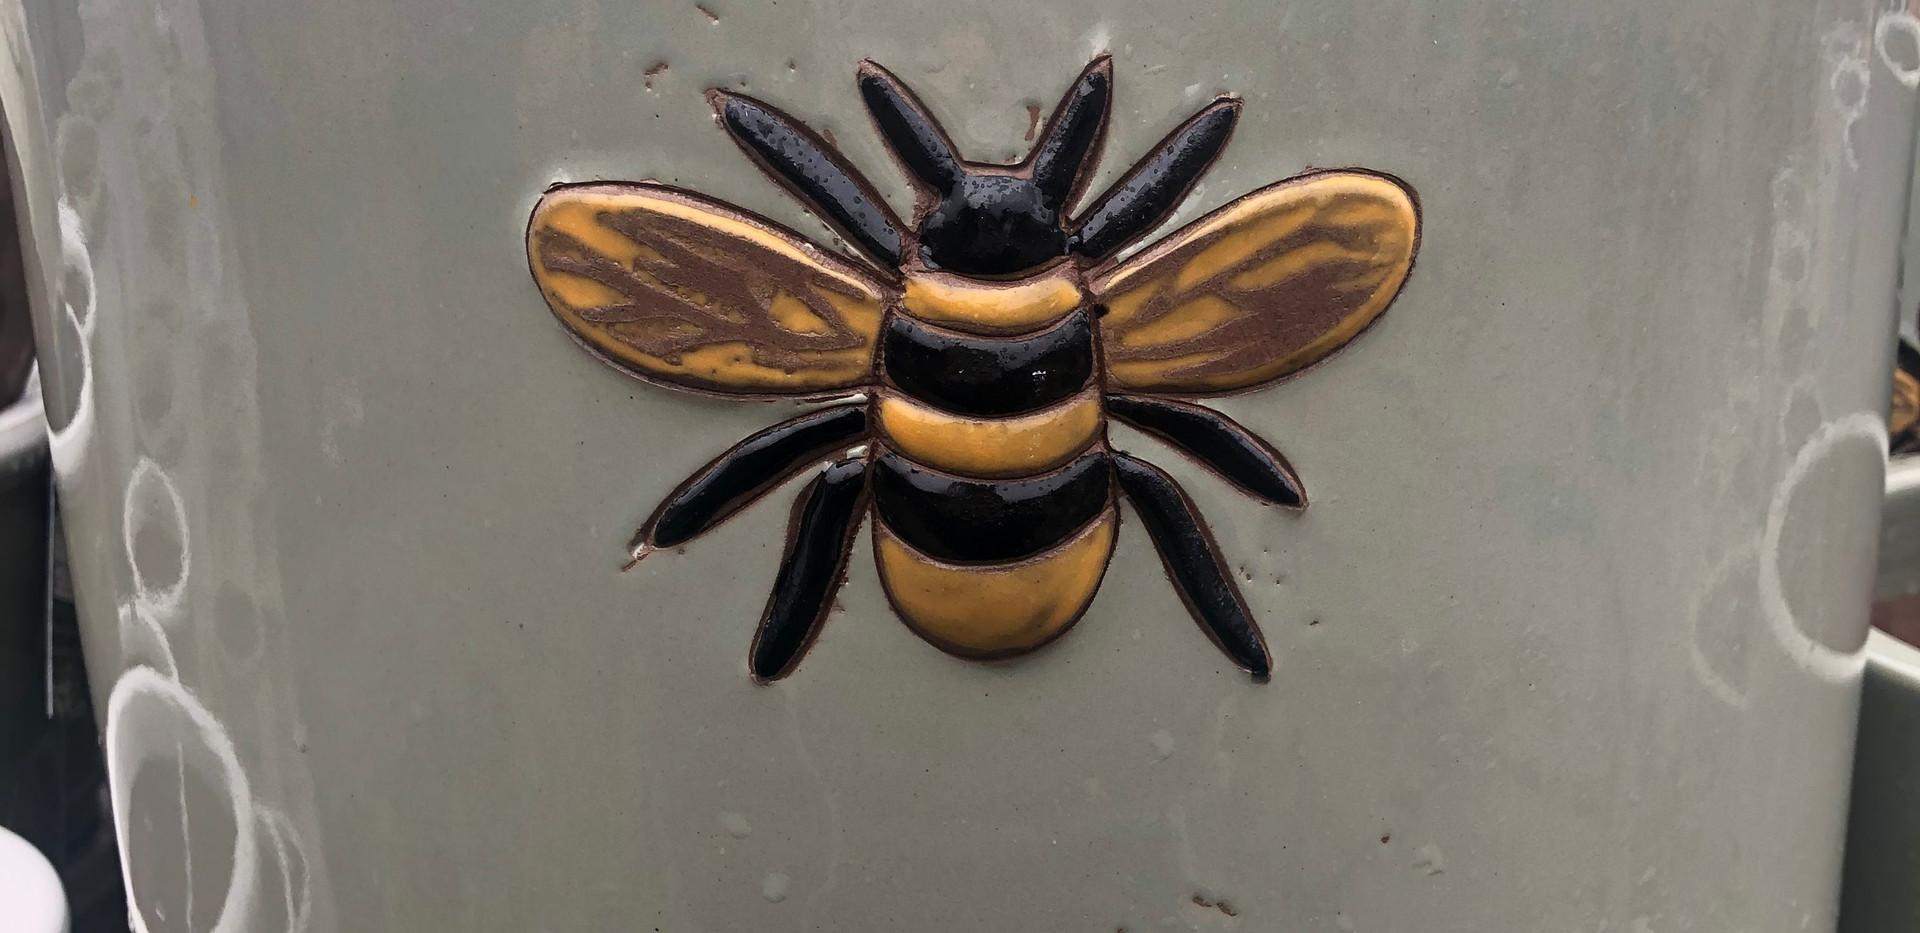 Woodlodge Wisteria Pot Bee